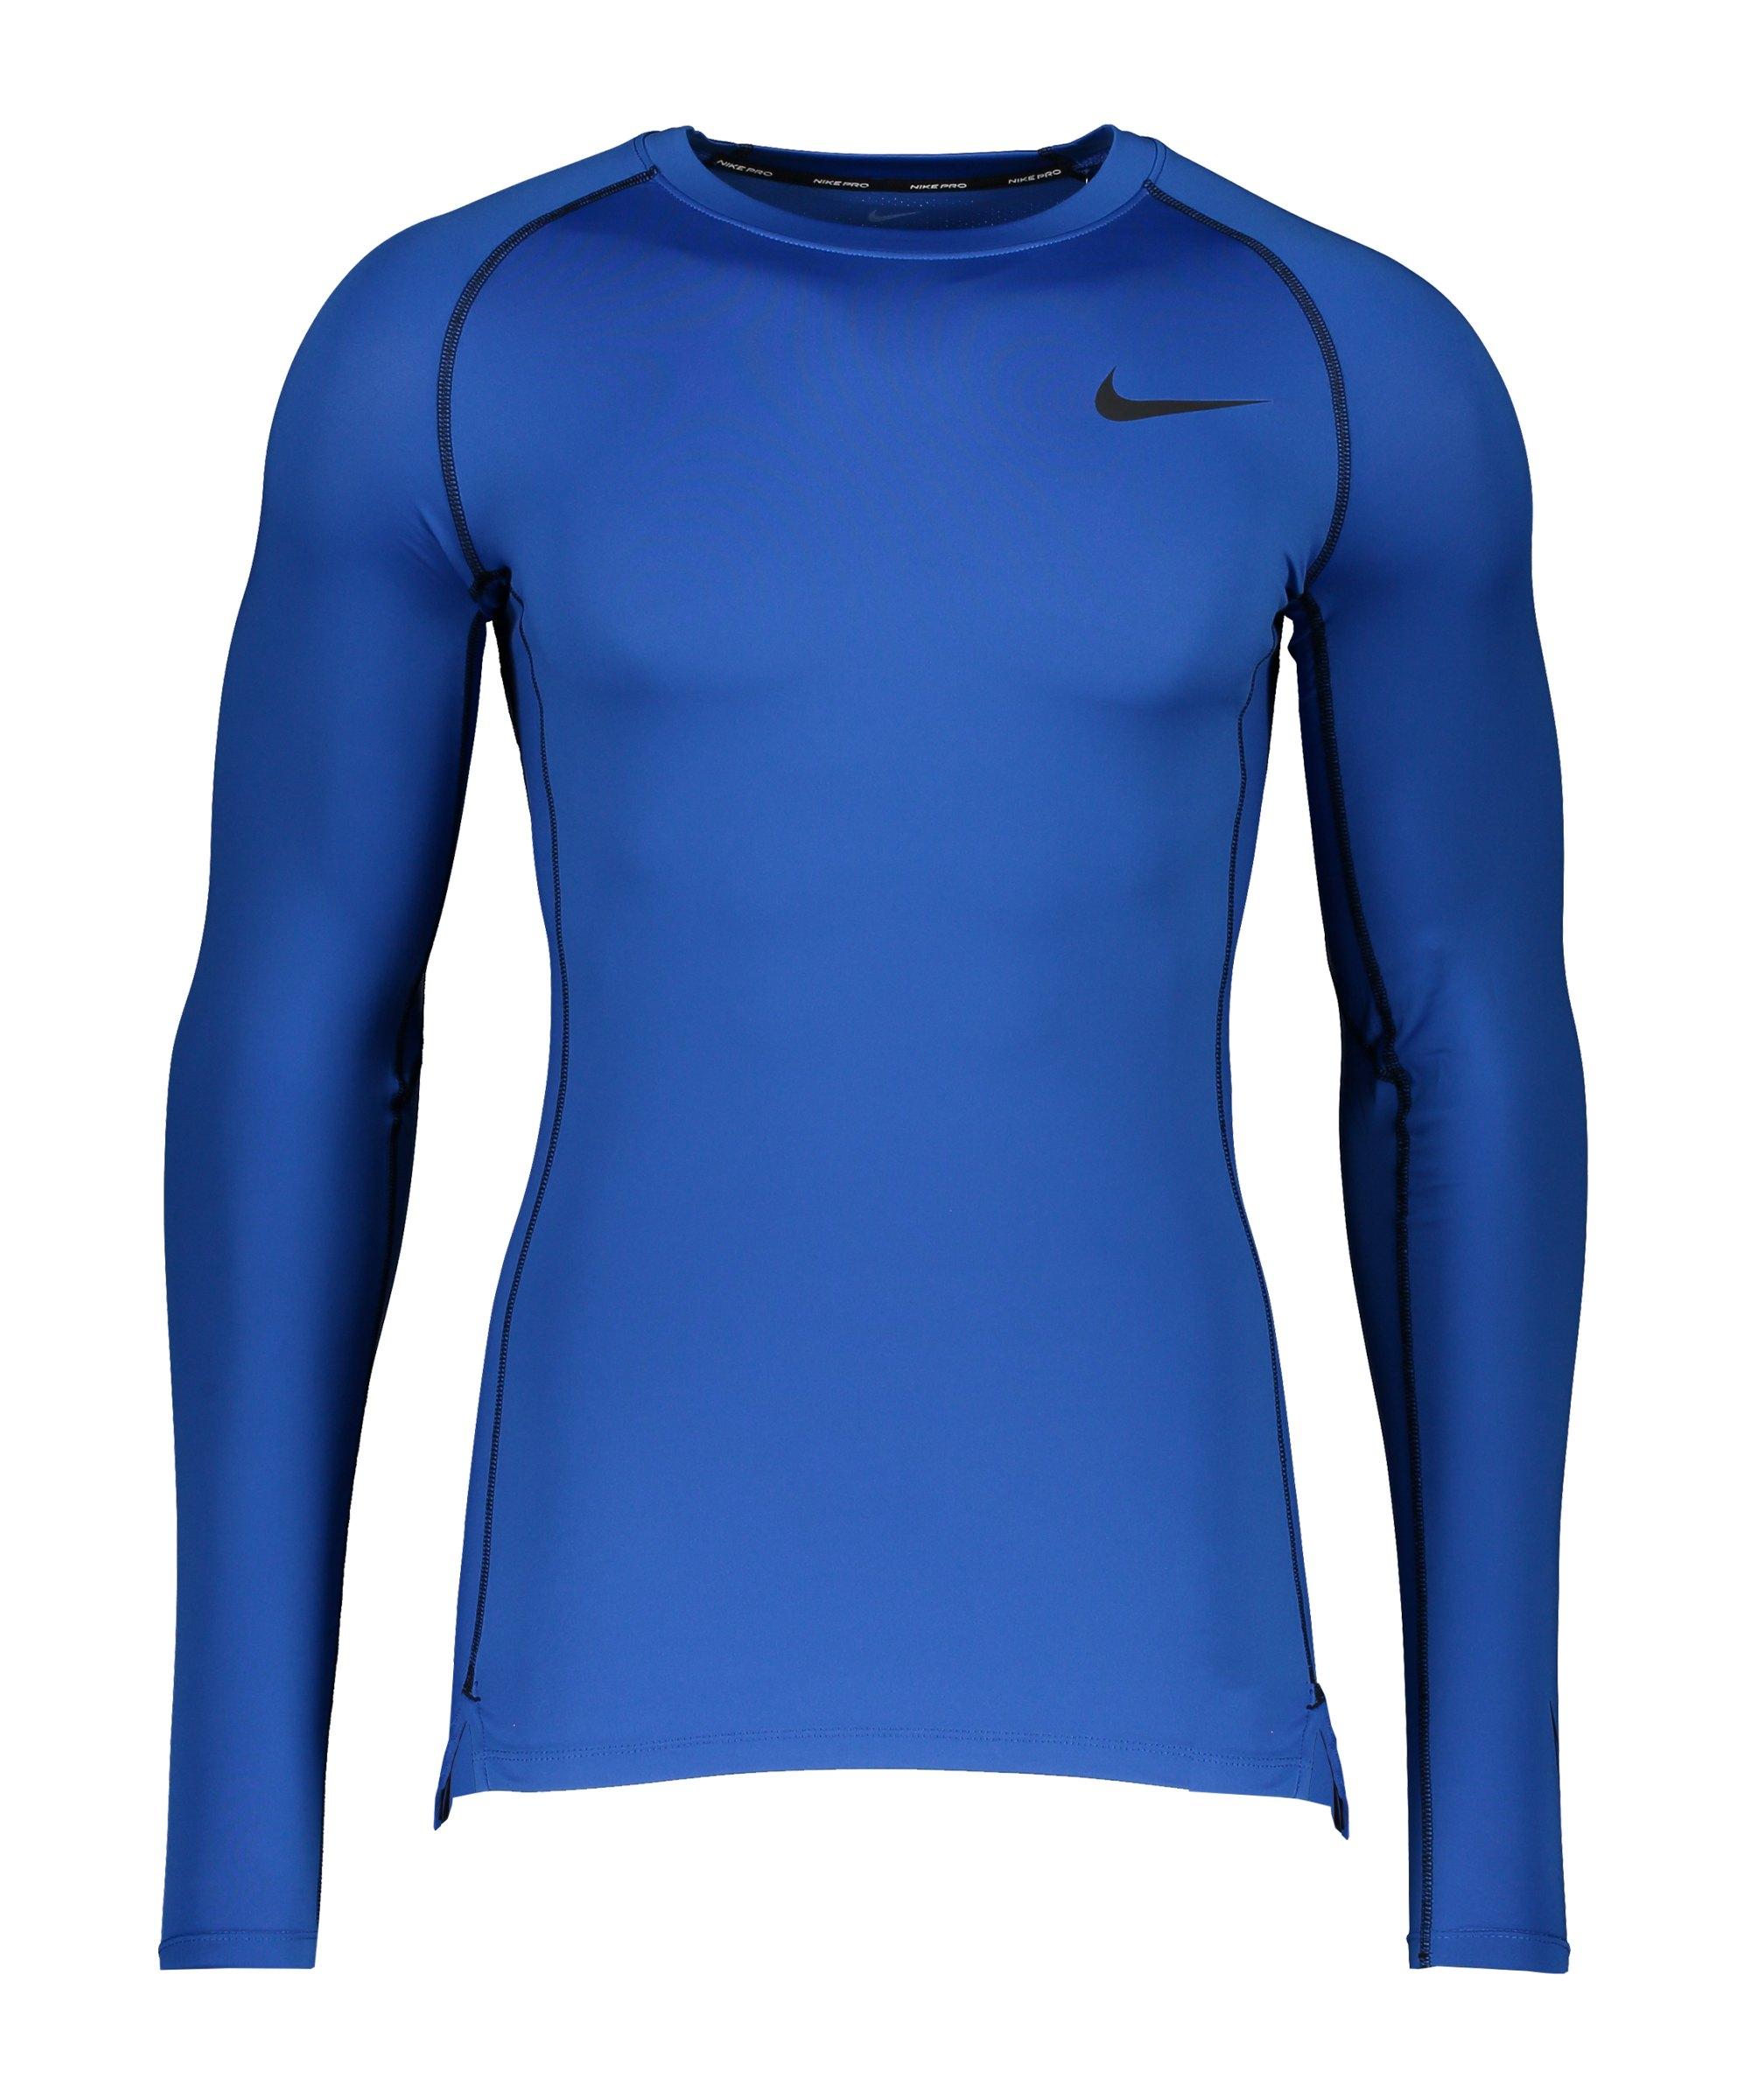 Nike Pro Longsleeve Shirt Blau Schwarz F480 - blau